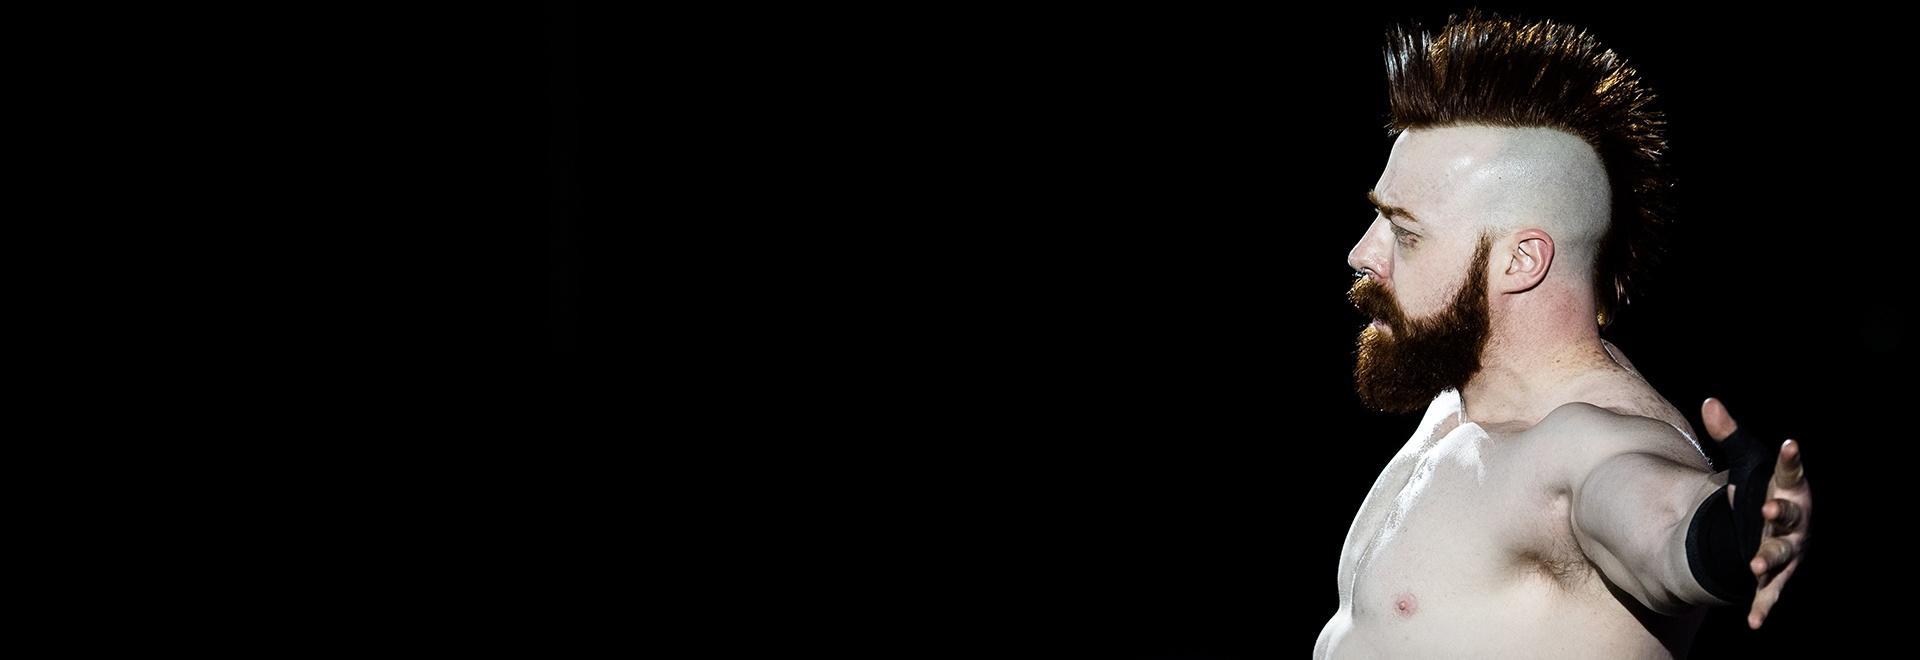 Ep. 27